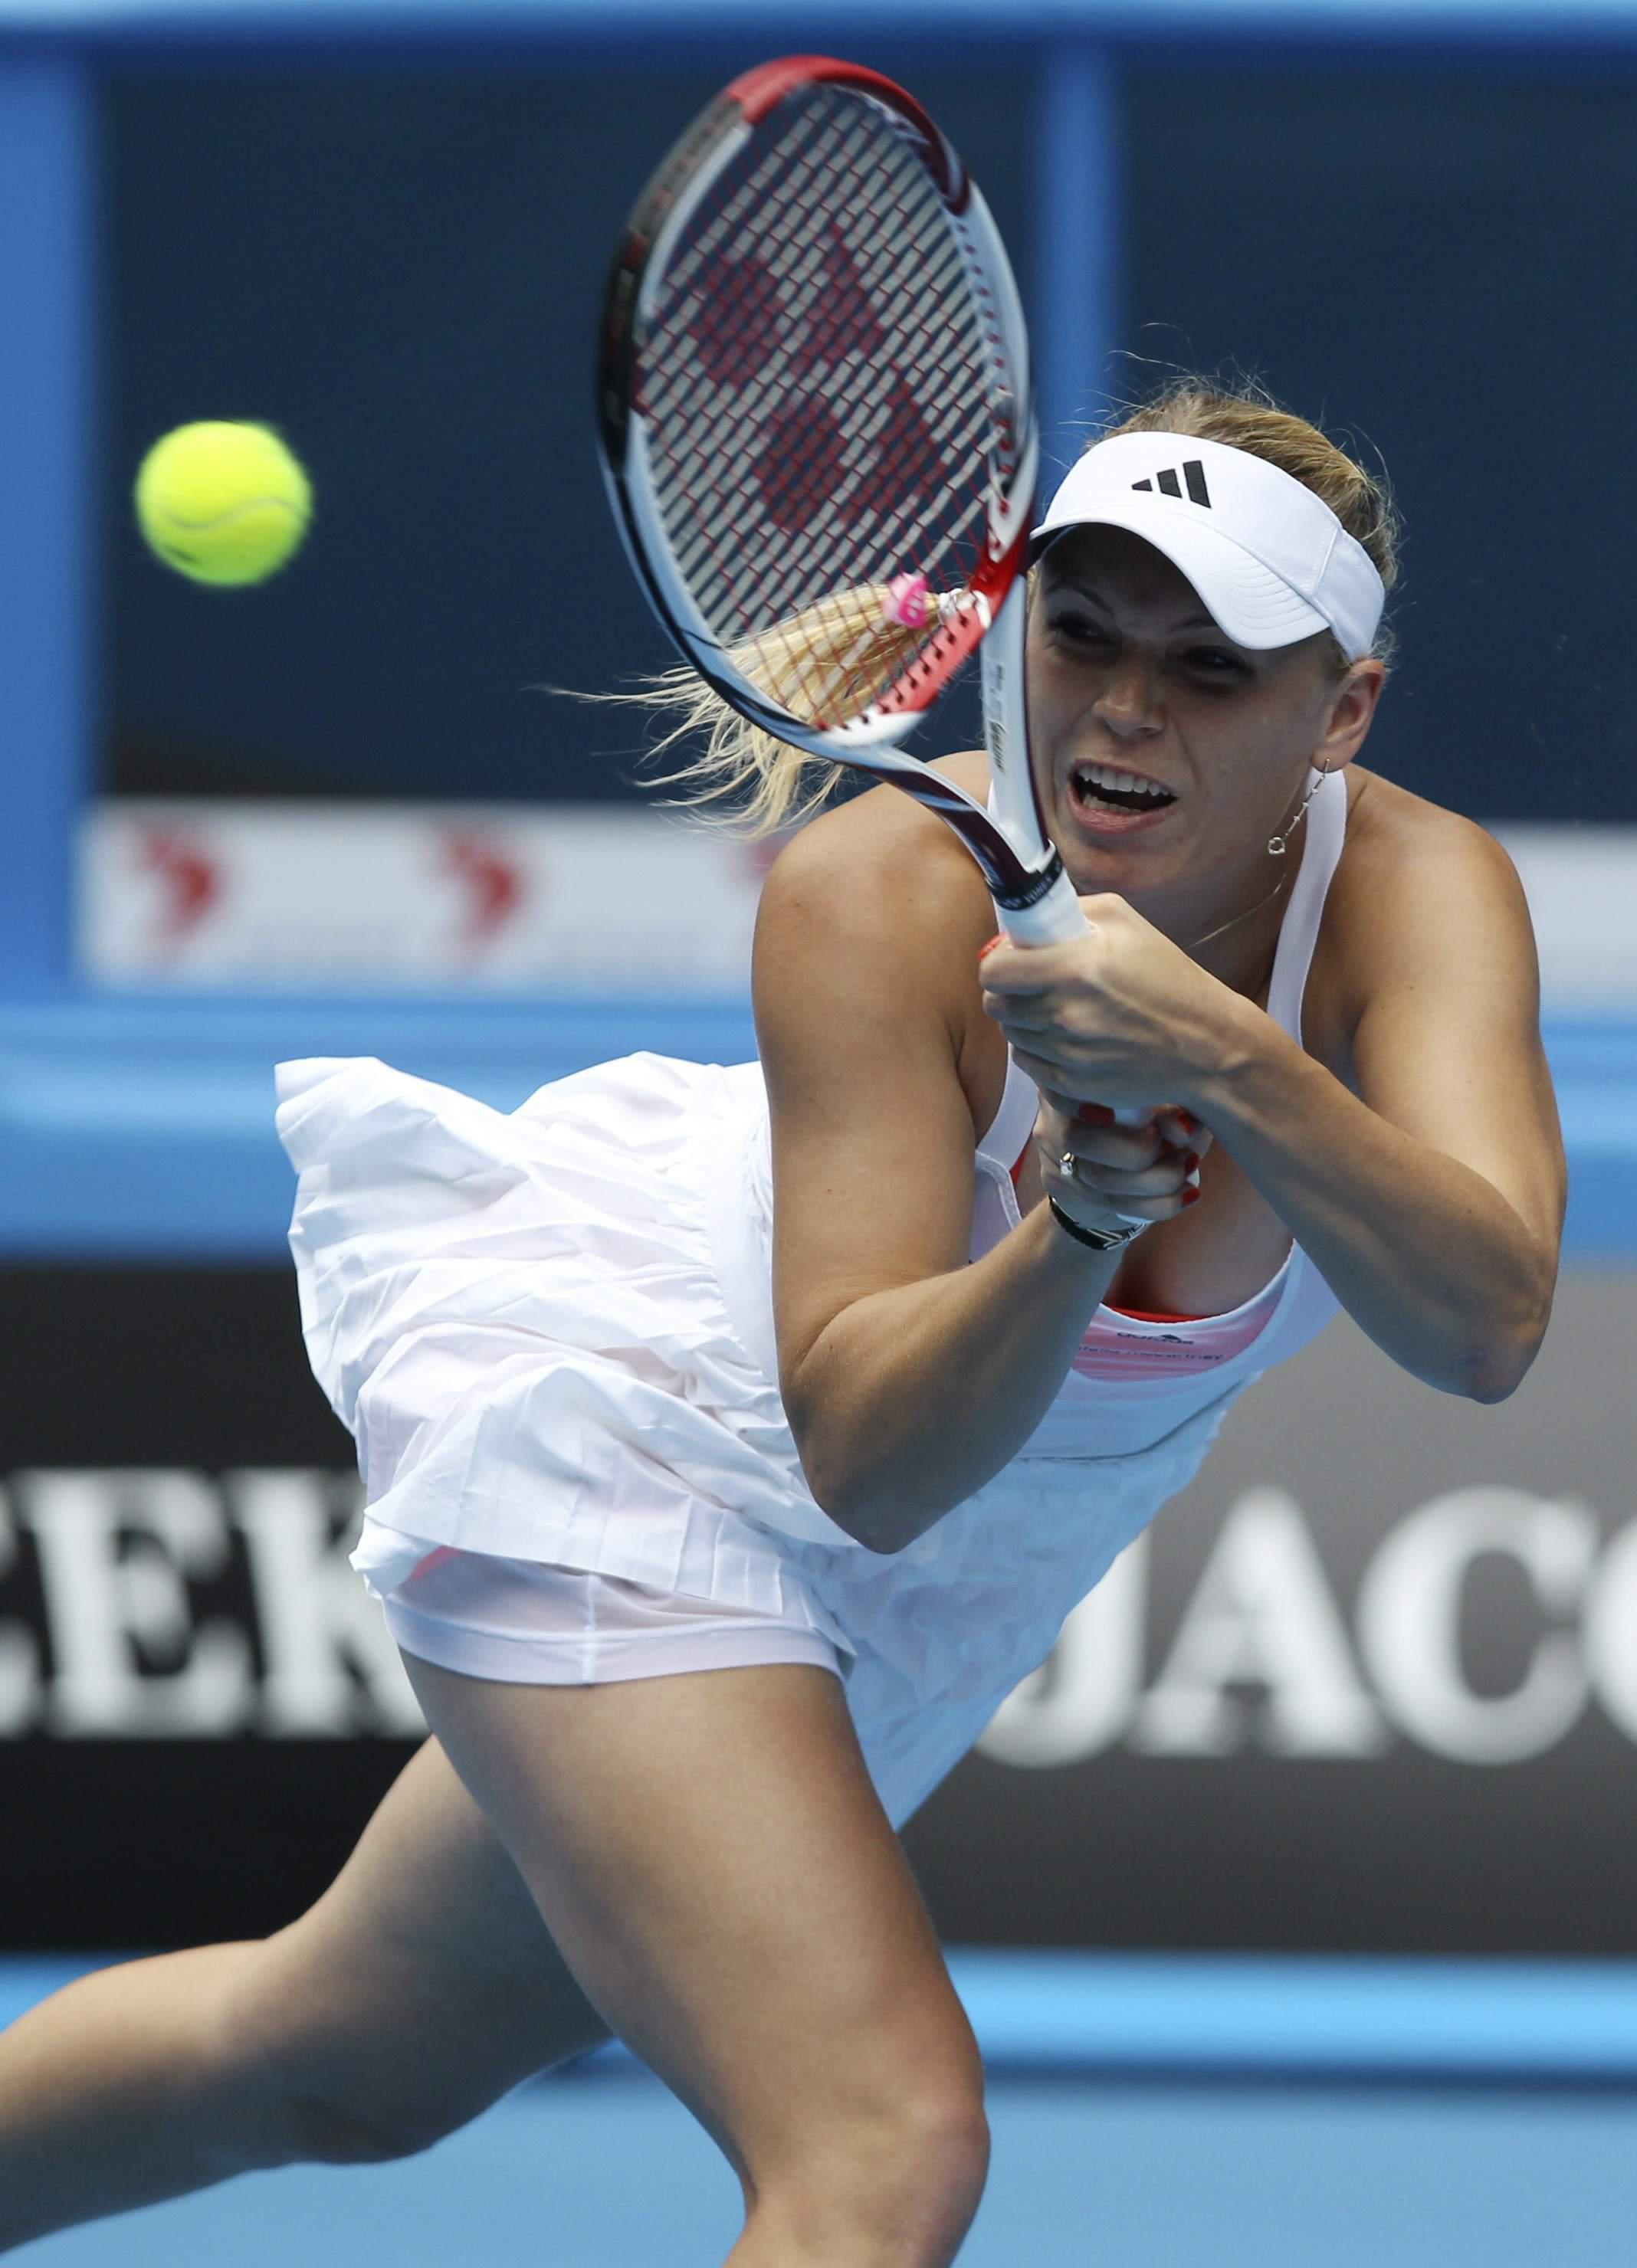 Las fotos de Caroline Wozniacki desnuda para Sports